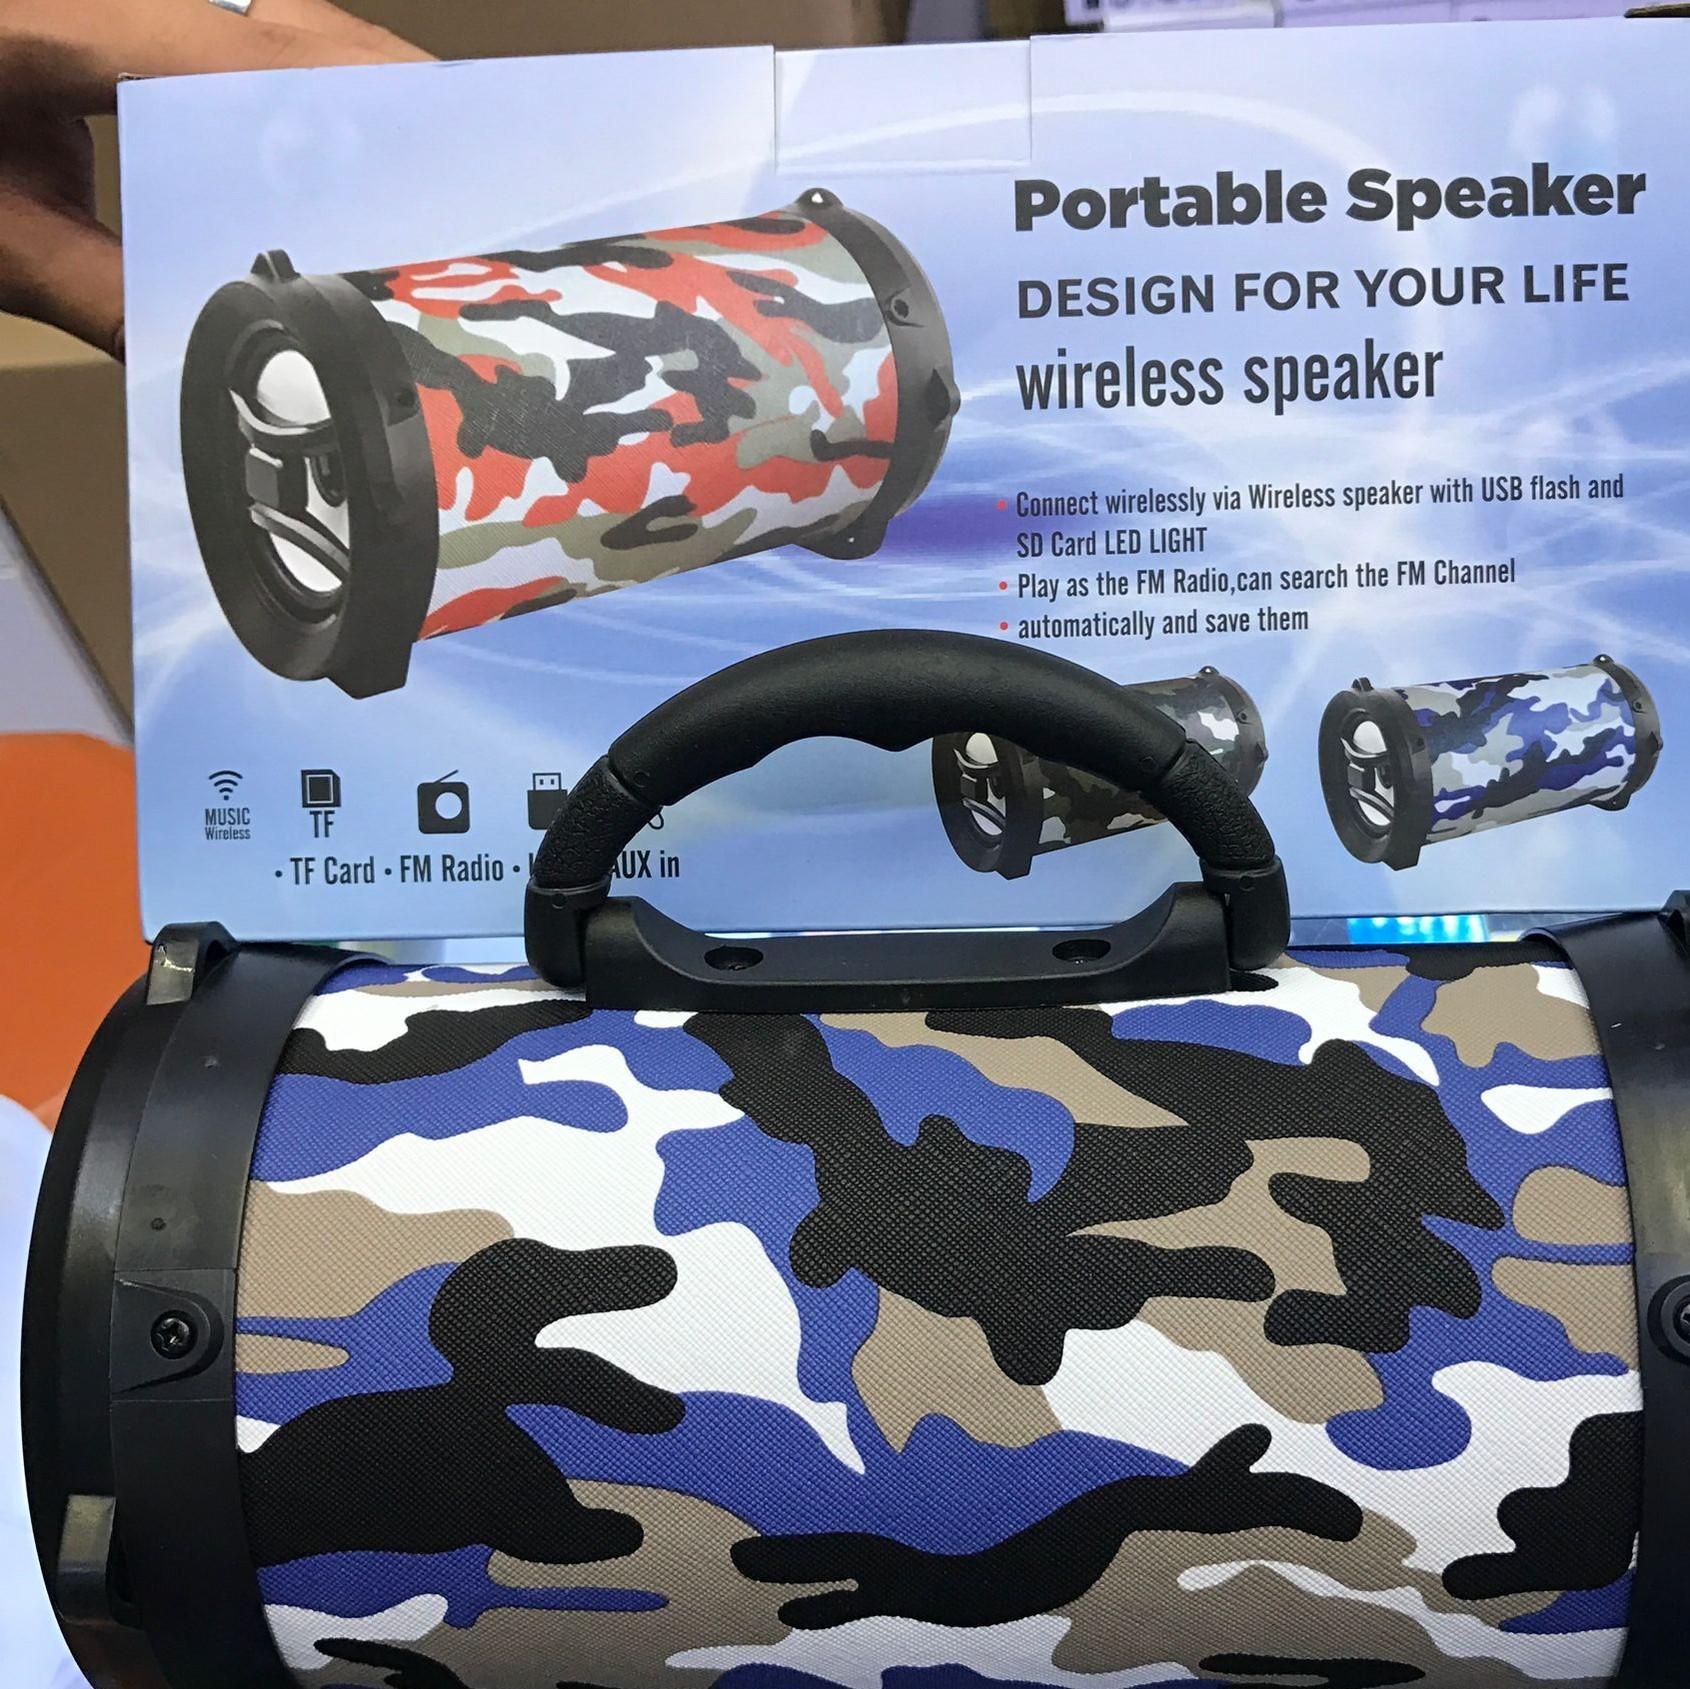 New bluetooth speaker for outdoor portable bag, high power wireless card, large gun barrel, bluetooth speaker